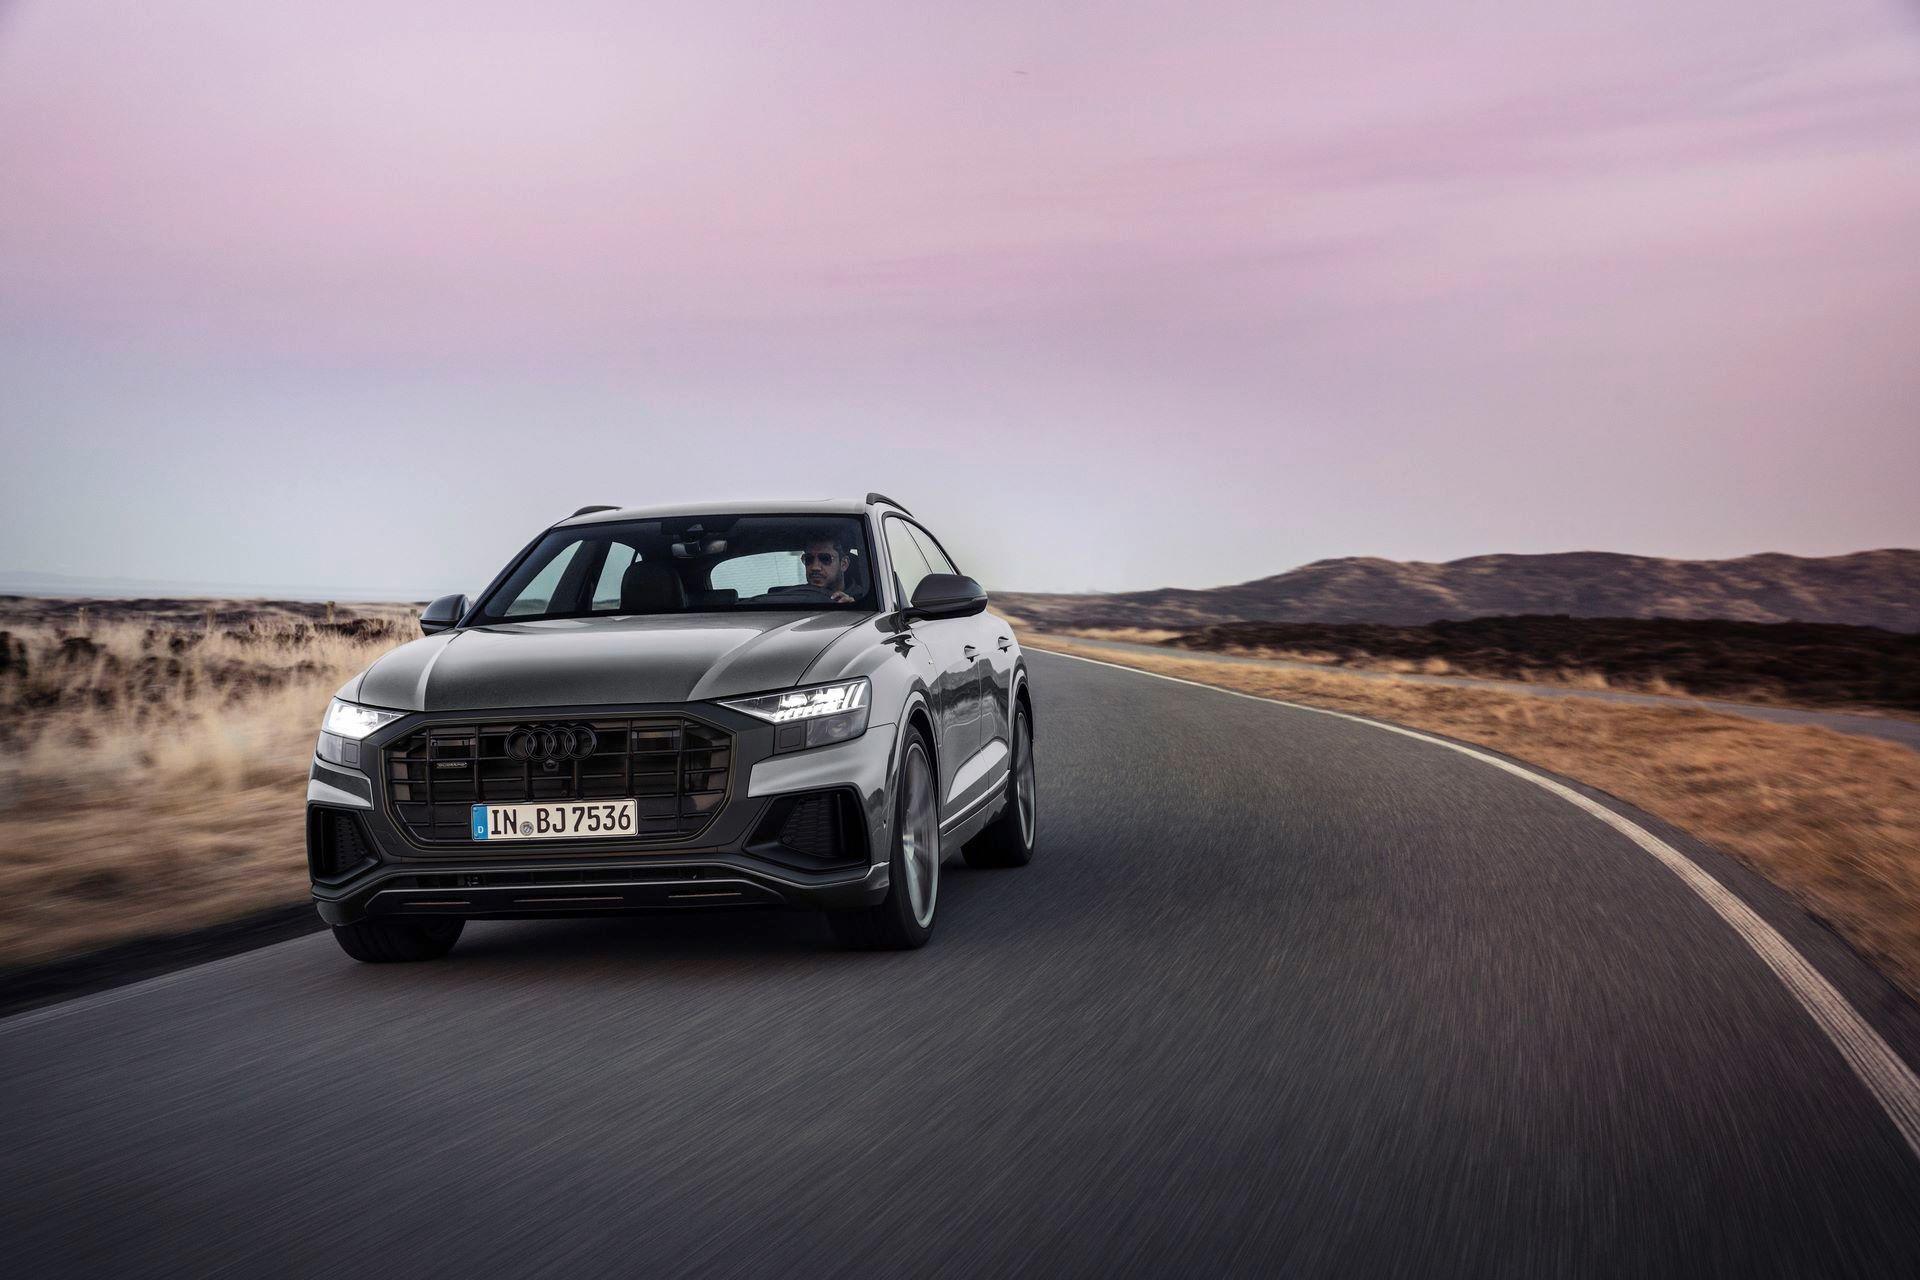 Audi-A4-A5-Q7-Q8-Competition-And-Competition-Plus-Trims-28